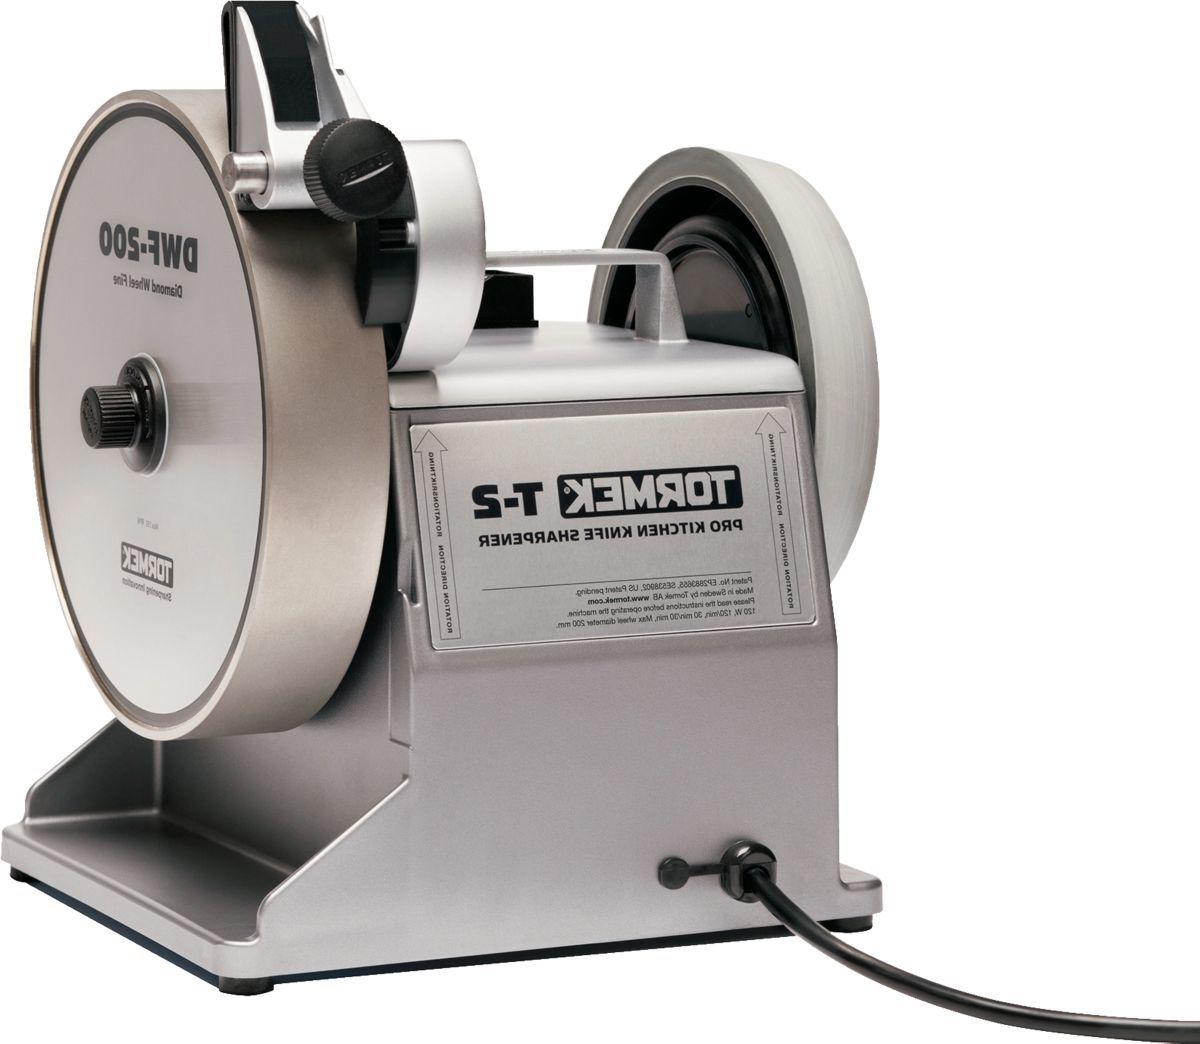 Tormek T-2 Pro Kitchen Sharpening System